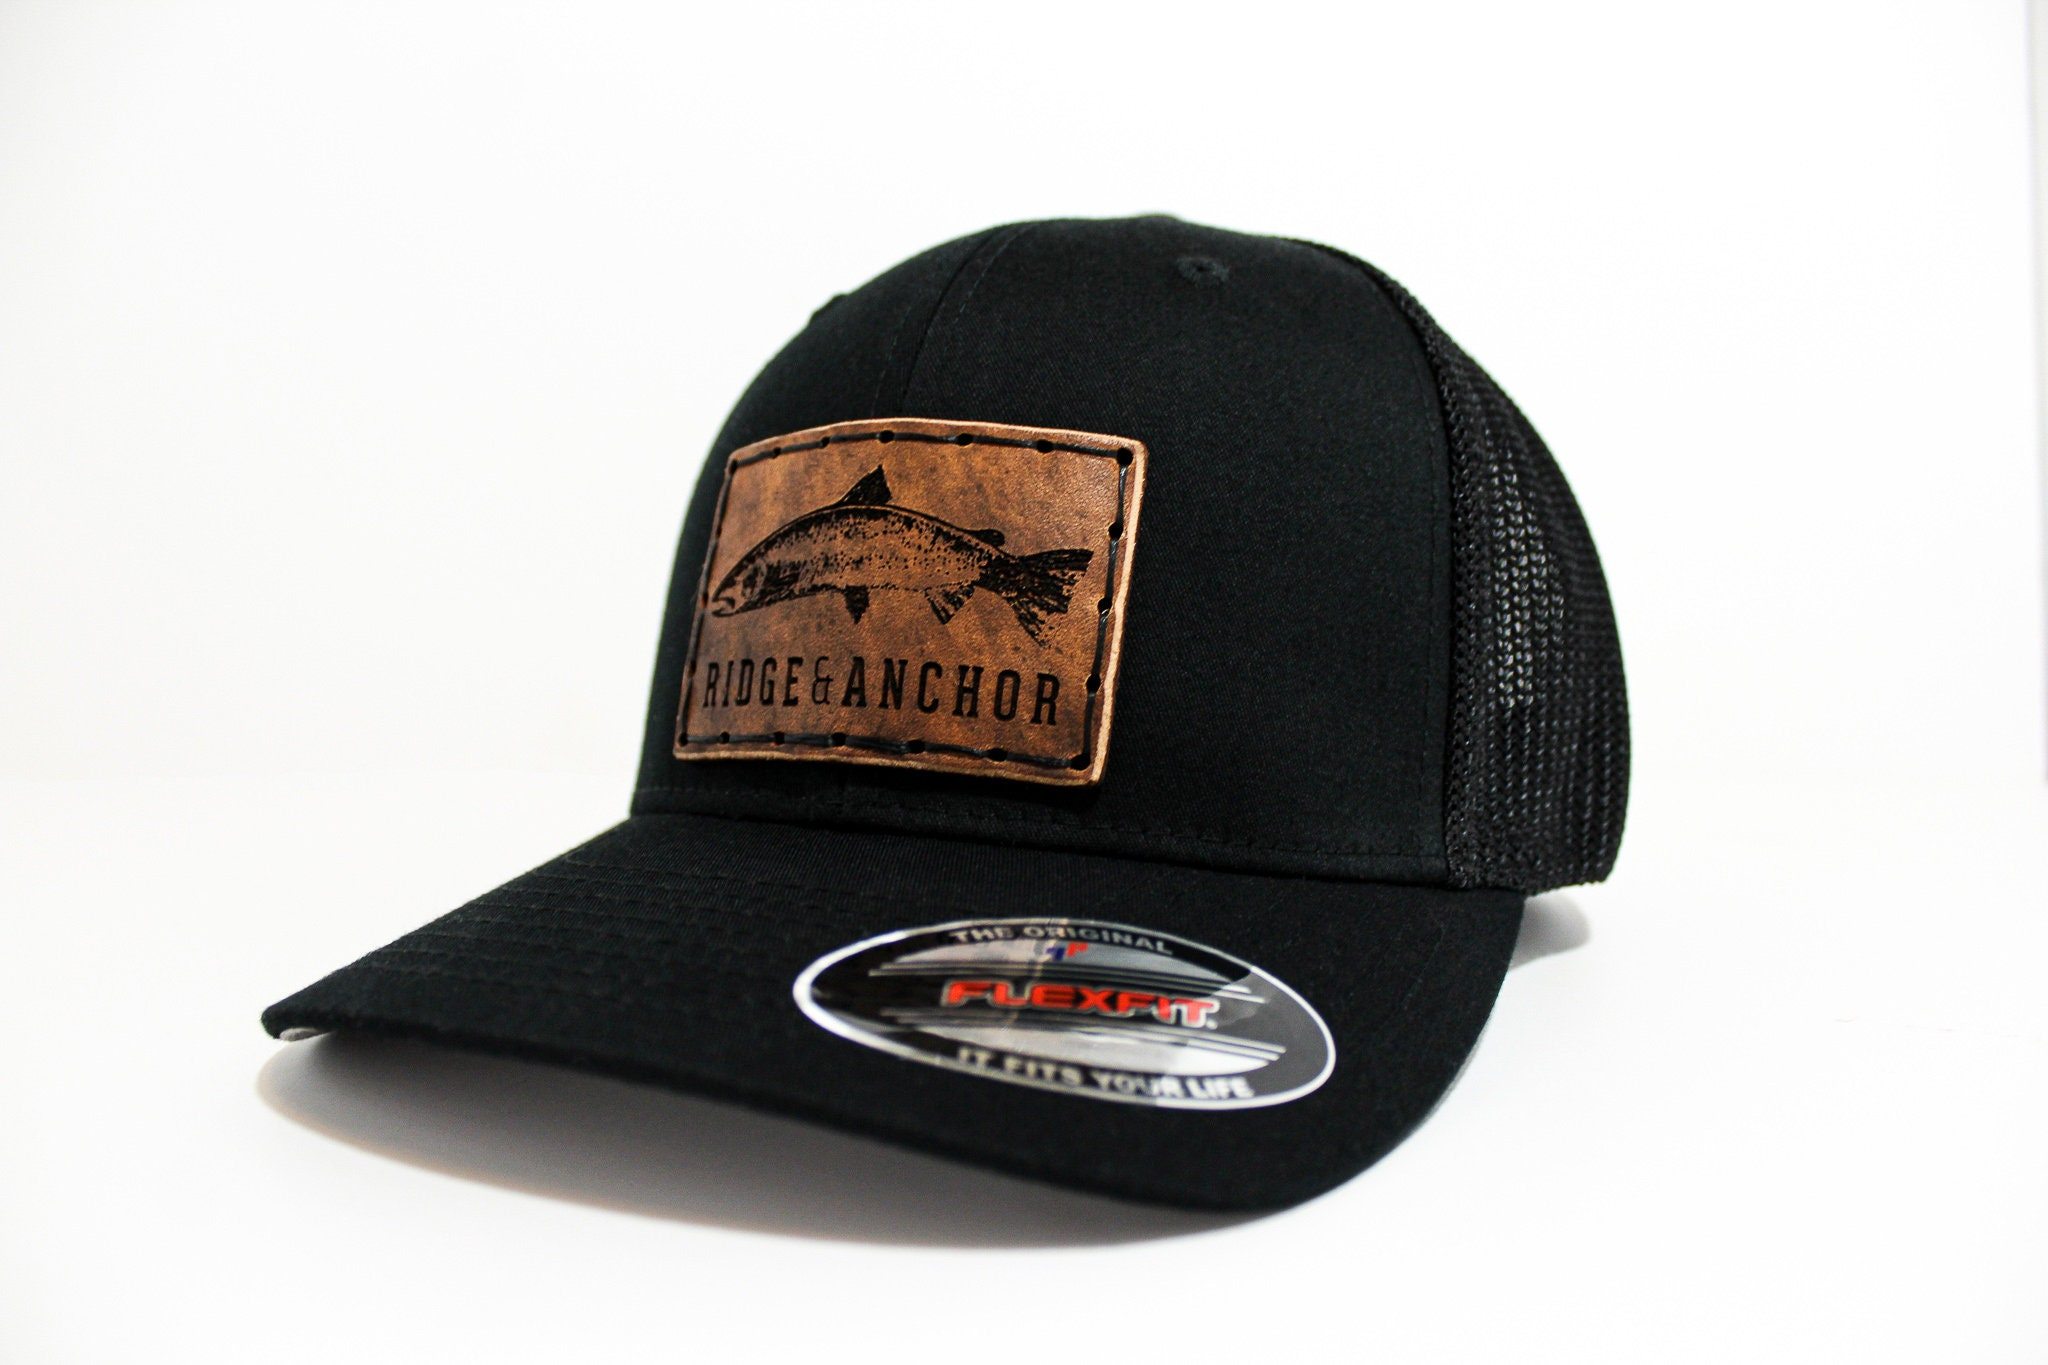 Solid Black Flexfit model 6511 w/ Ridge & Anchor Salmon Logo - Custom  handstitched leather patch hat